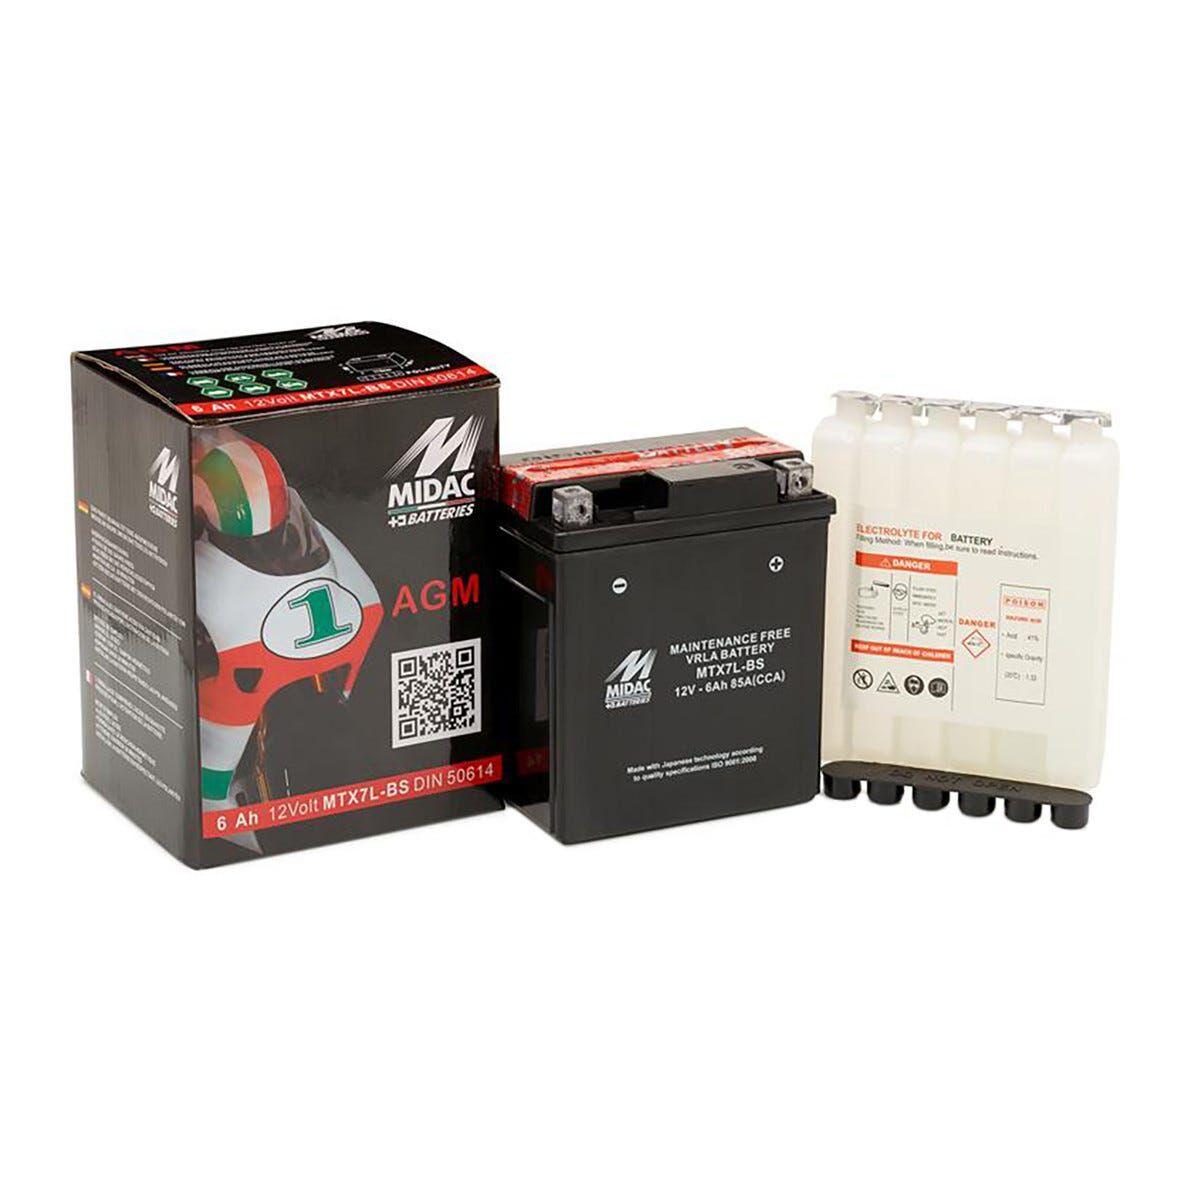 Batteria Moto 6 Ah Midac Con Flaconcini Acido 113x70x130 Mm (Lxpxh) Peso 2,504 Kg